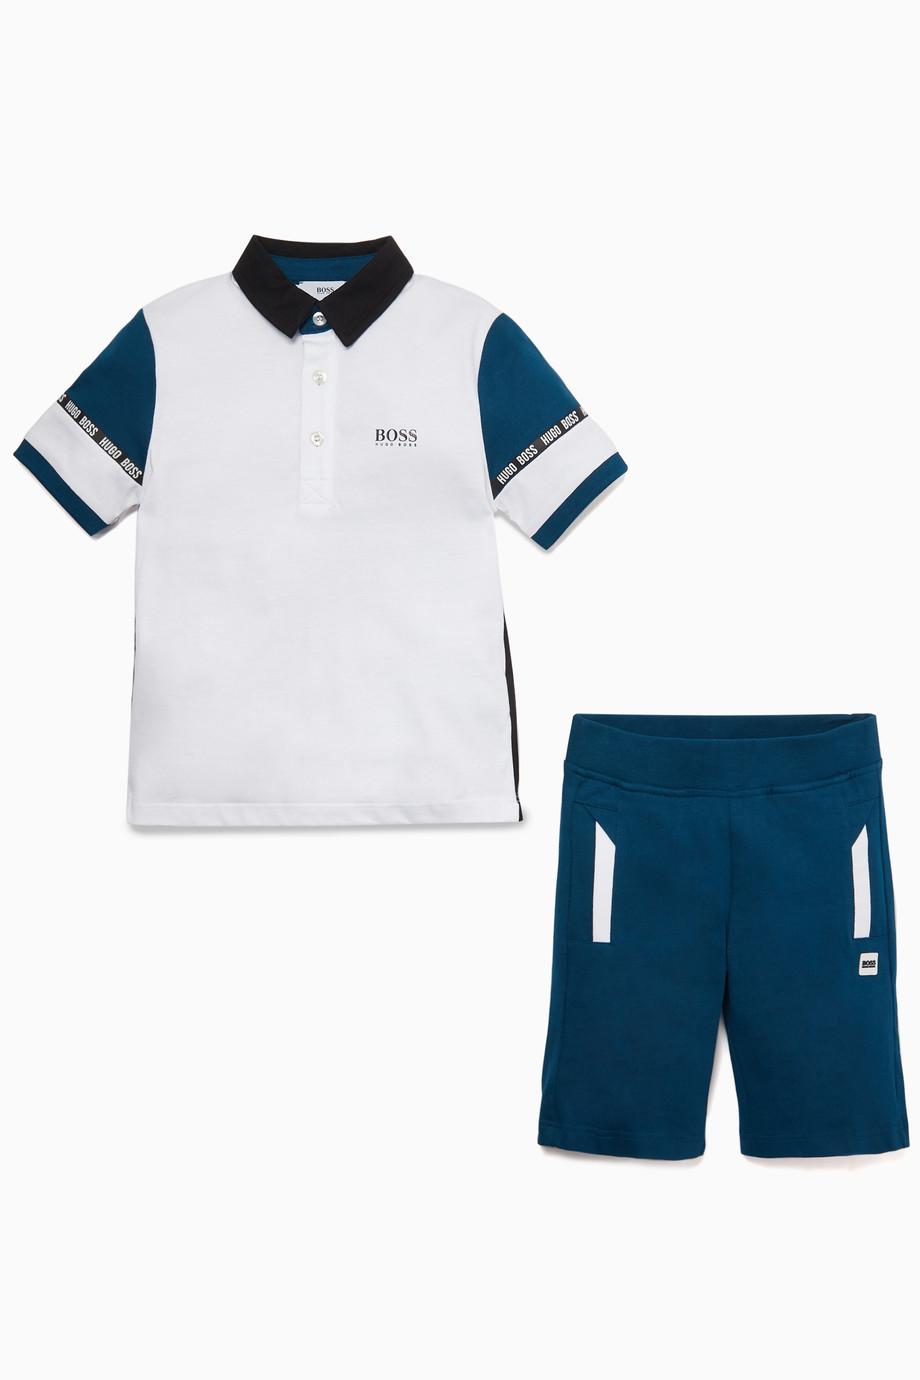 6f1558560c559 Shop Boss White Polo Shirt & Shorts Set for Kids | Ounass Saudi